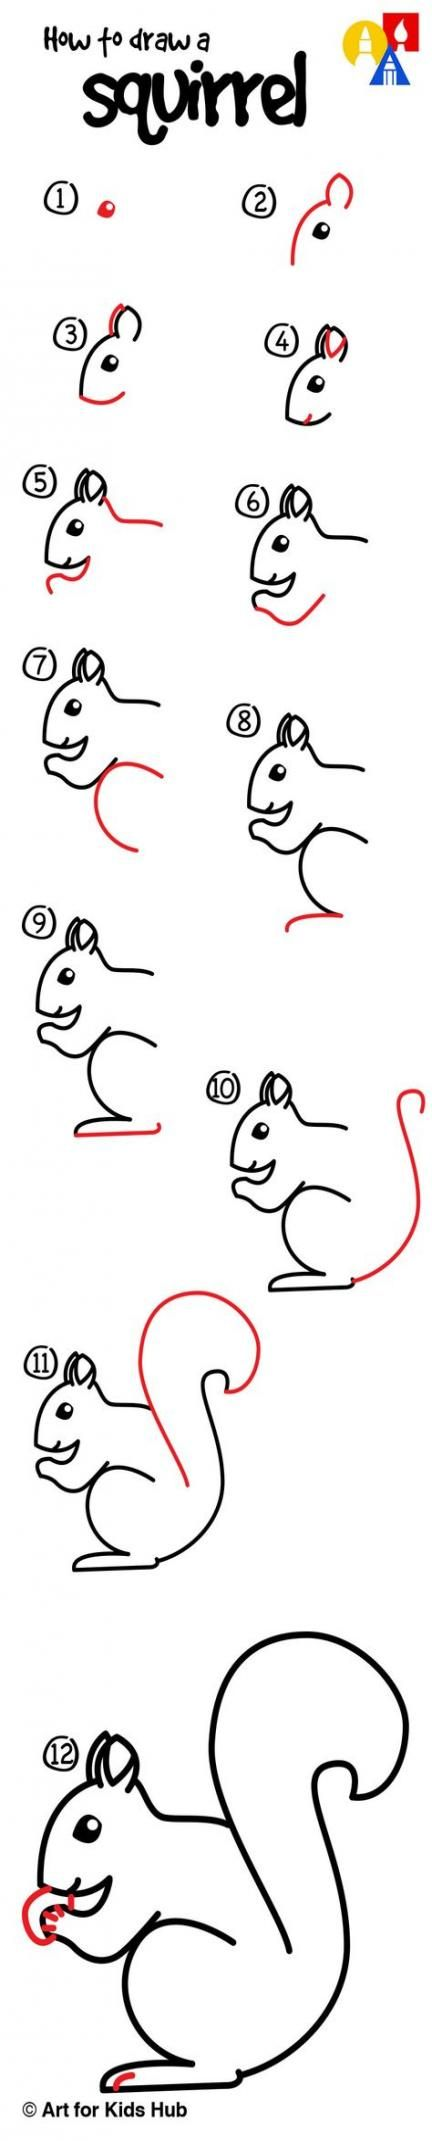 15 Ideas Drawing Animals Squirrel Drawing Art For Kids Hub Drawings Cute Drawings